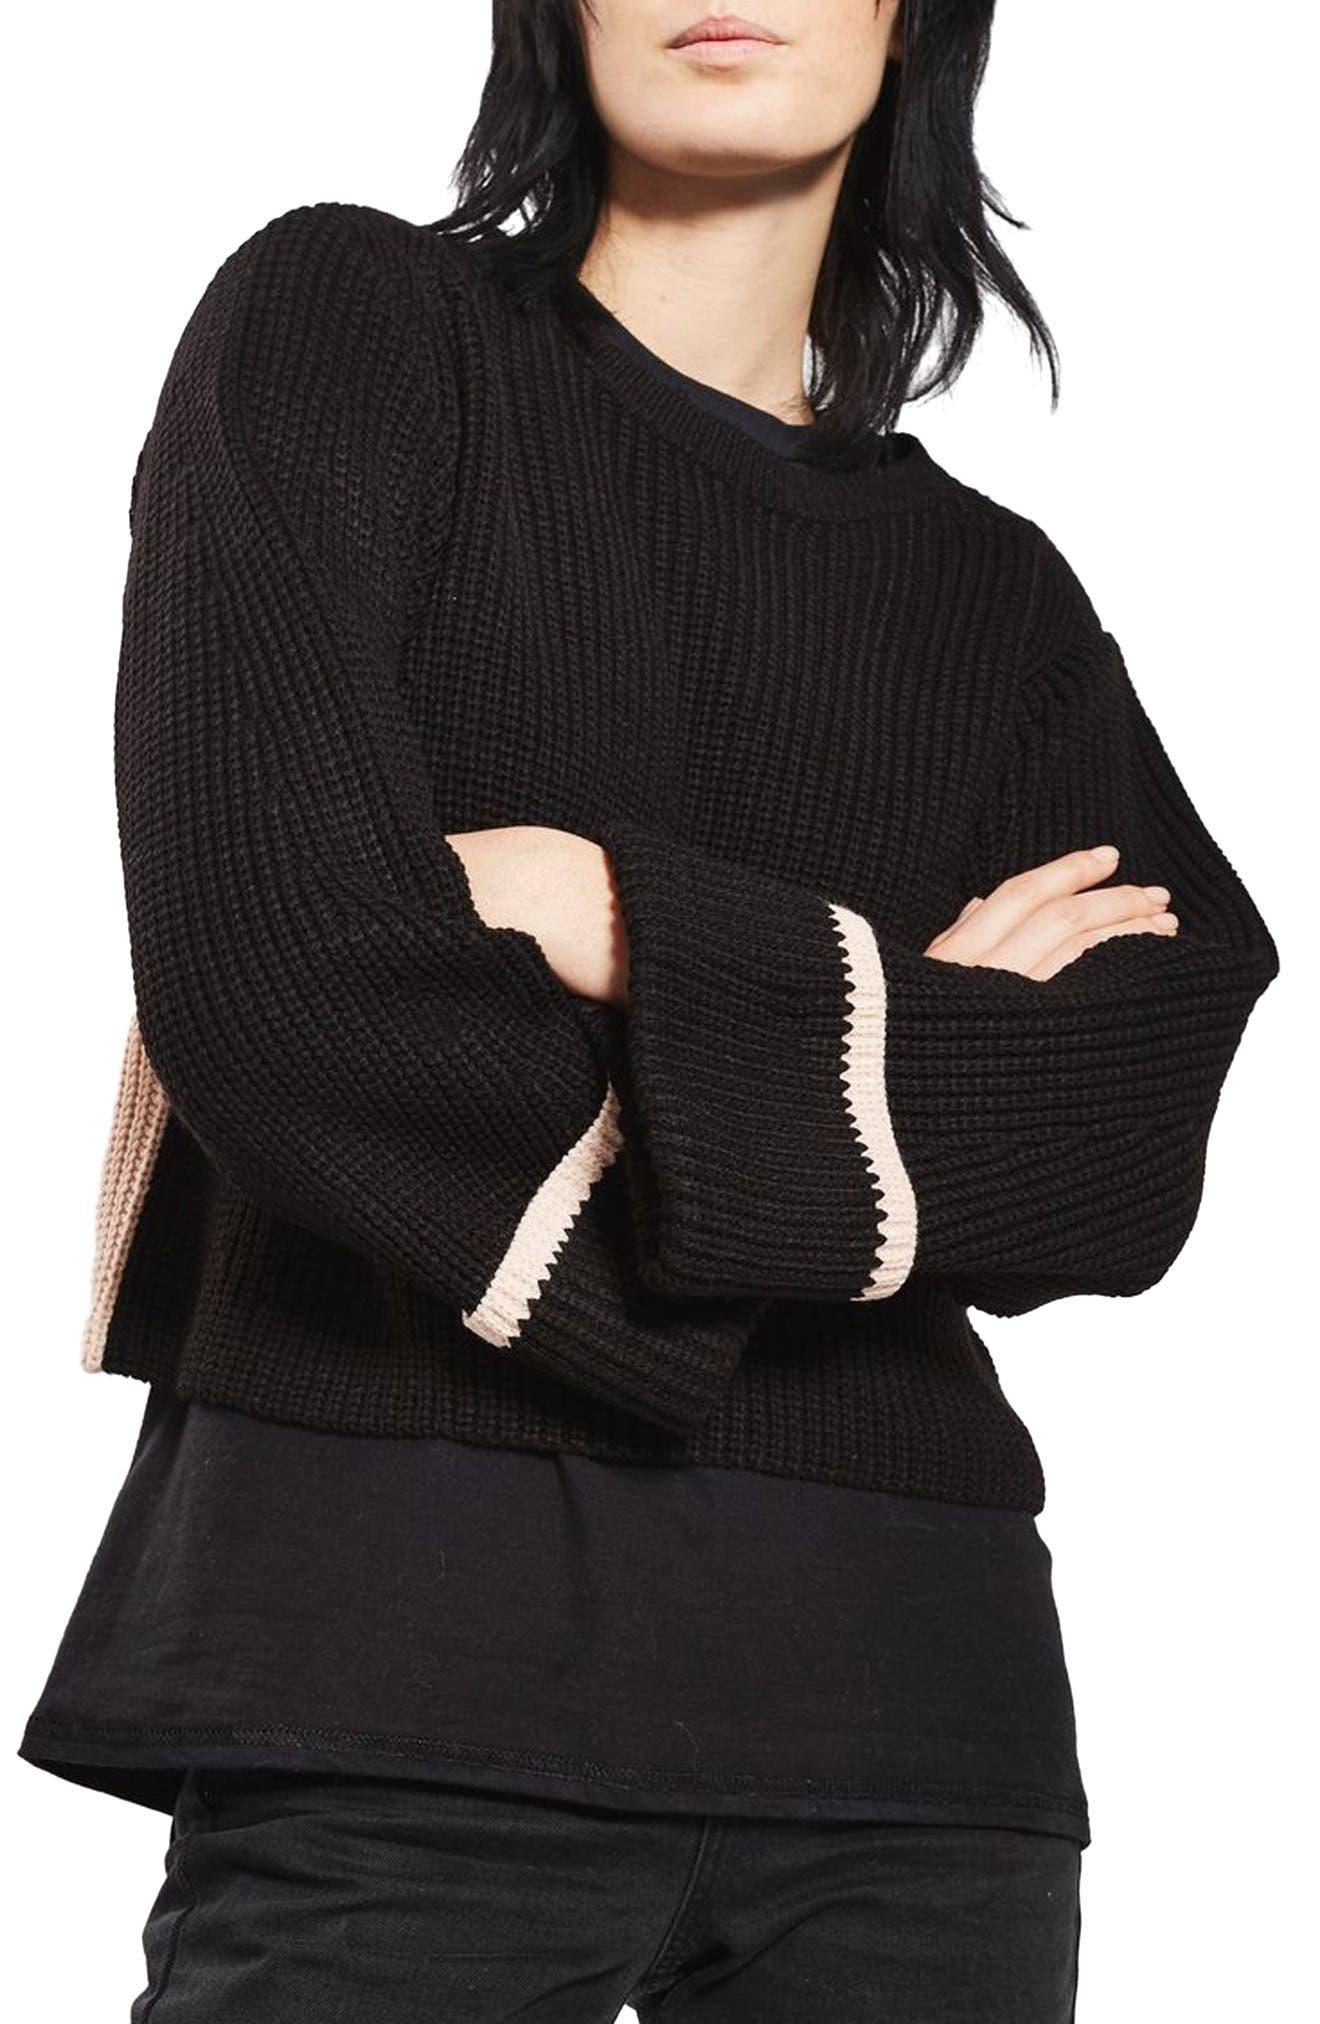 Alternate Image 1 Selected - Topshop Contrast Back Sweater